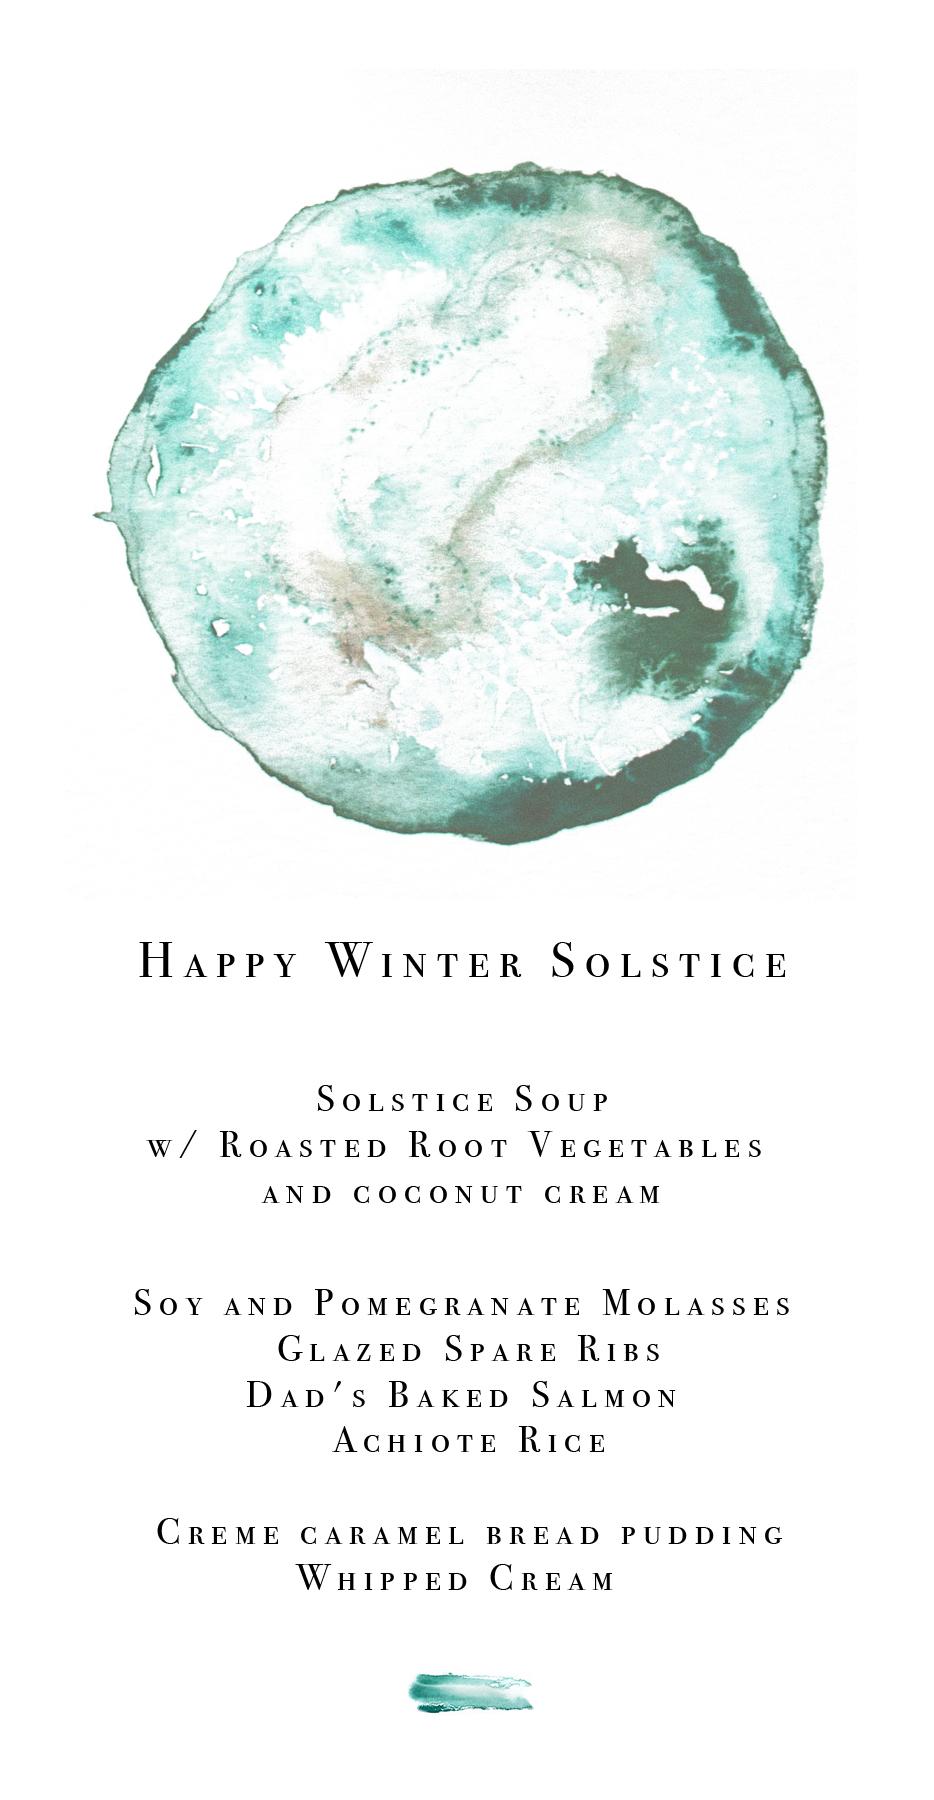 Happy Winter Solstice Menu Template Download — The Eternal Child